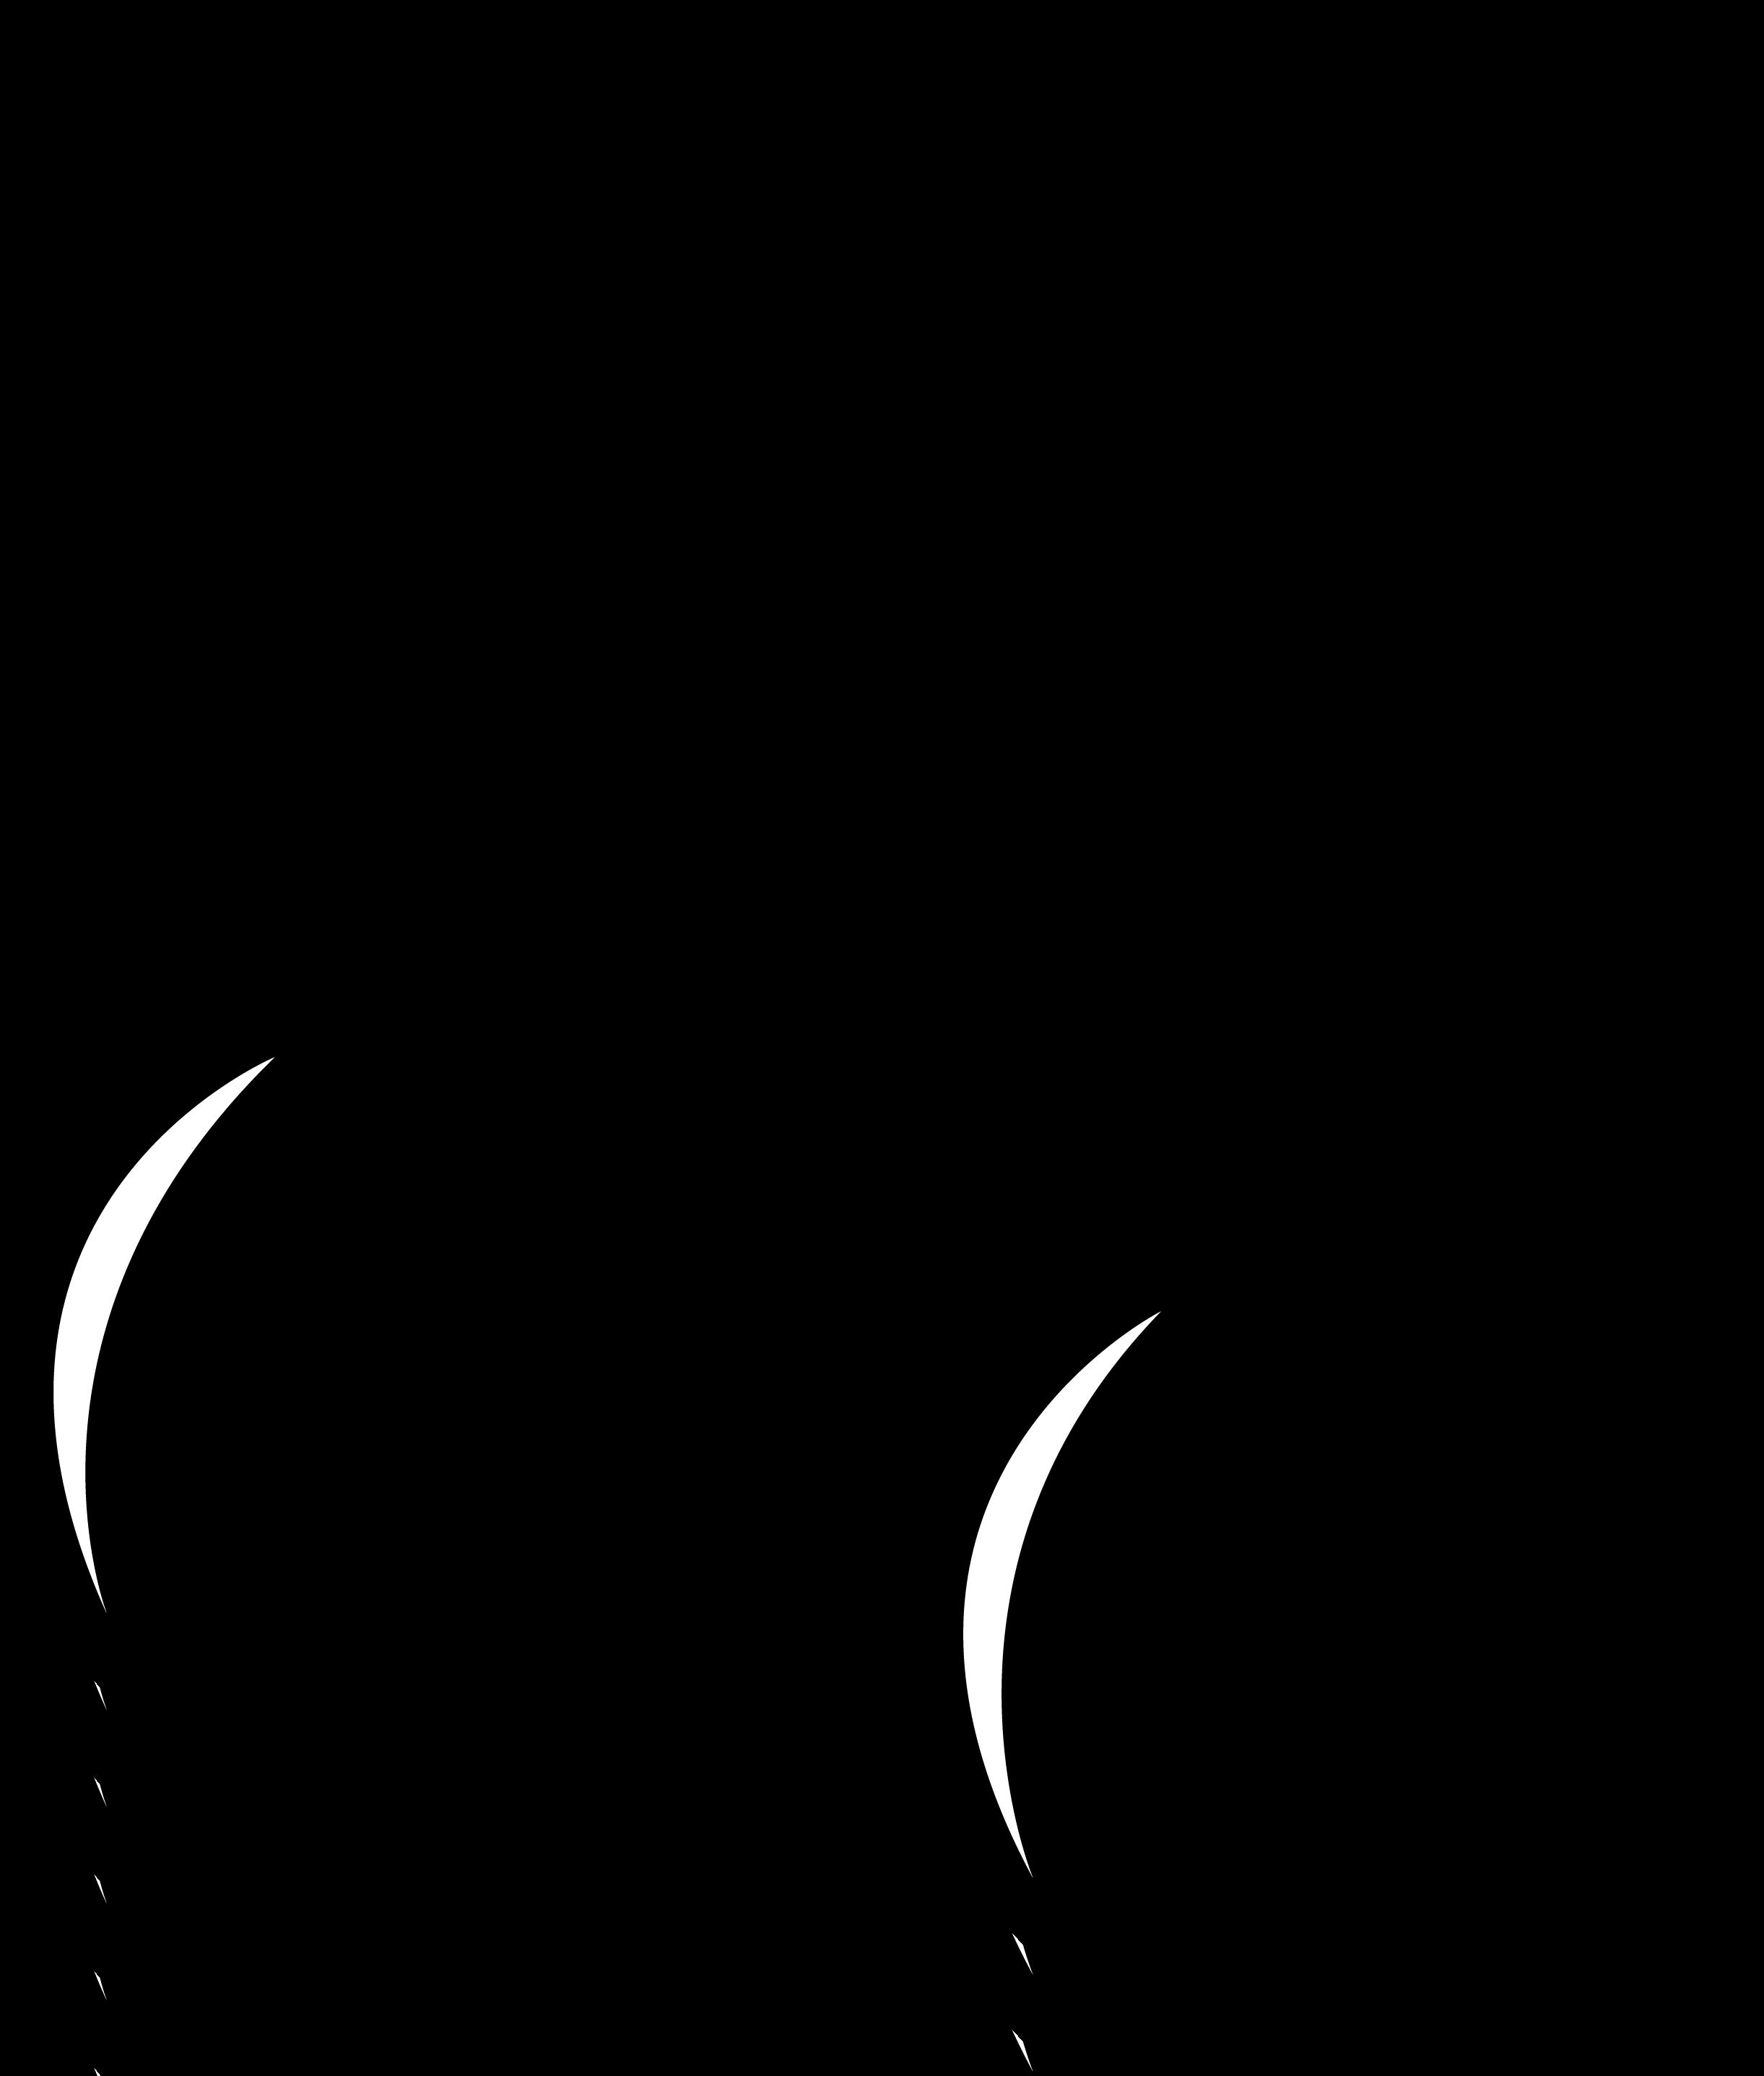 2443x2875 Black Cherries Silhouette